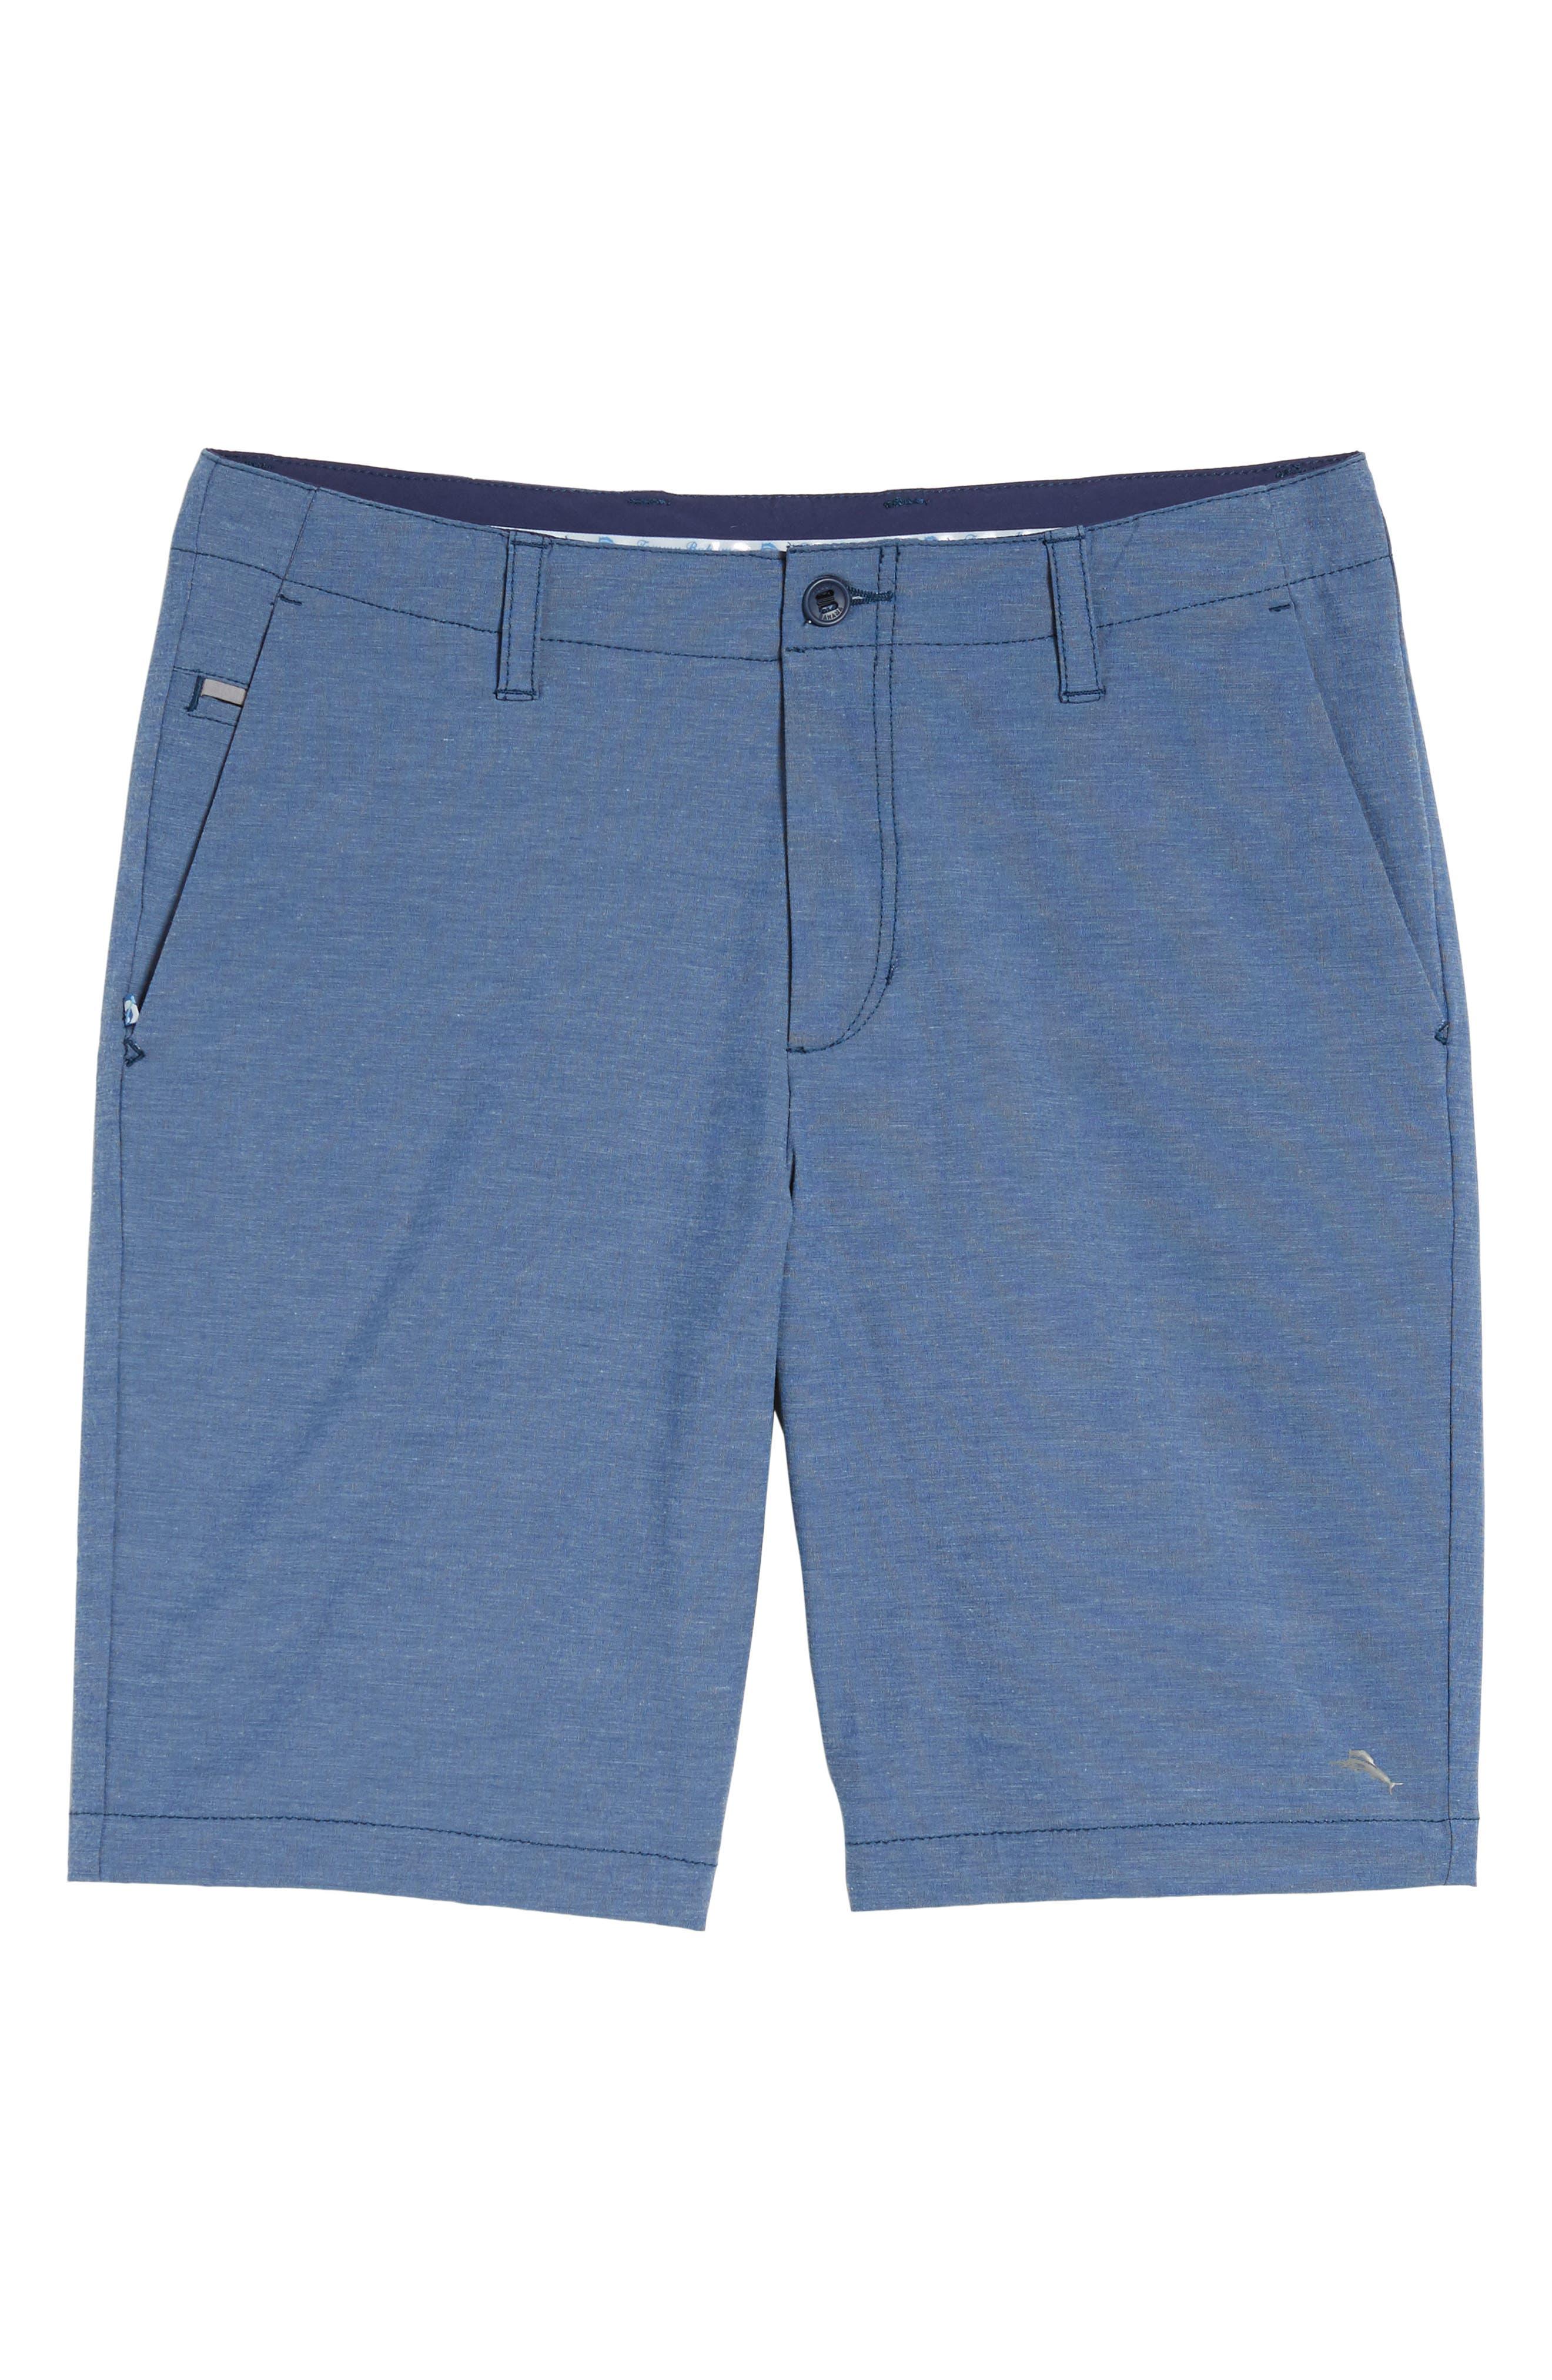 Chip & Run Shorts,                             Alternate thumbnail 6, color,                             400